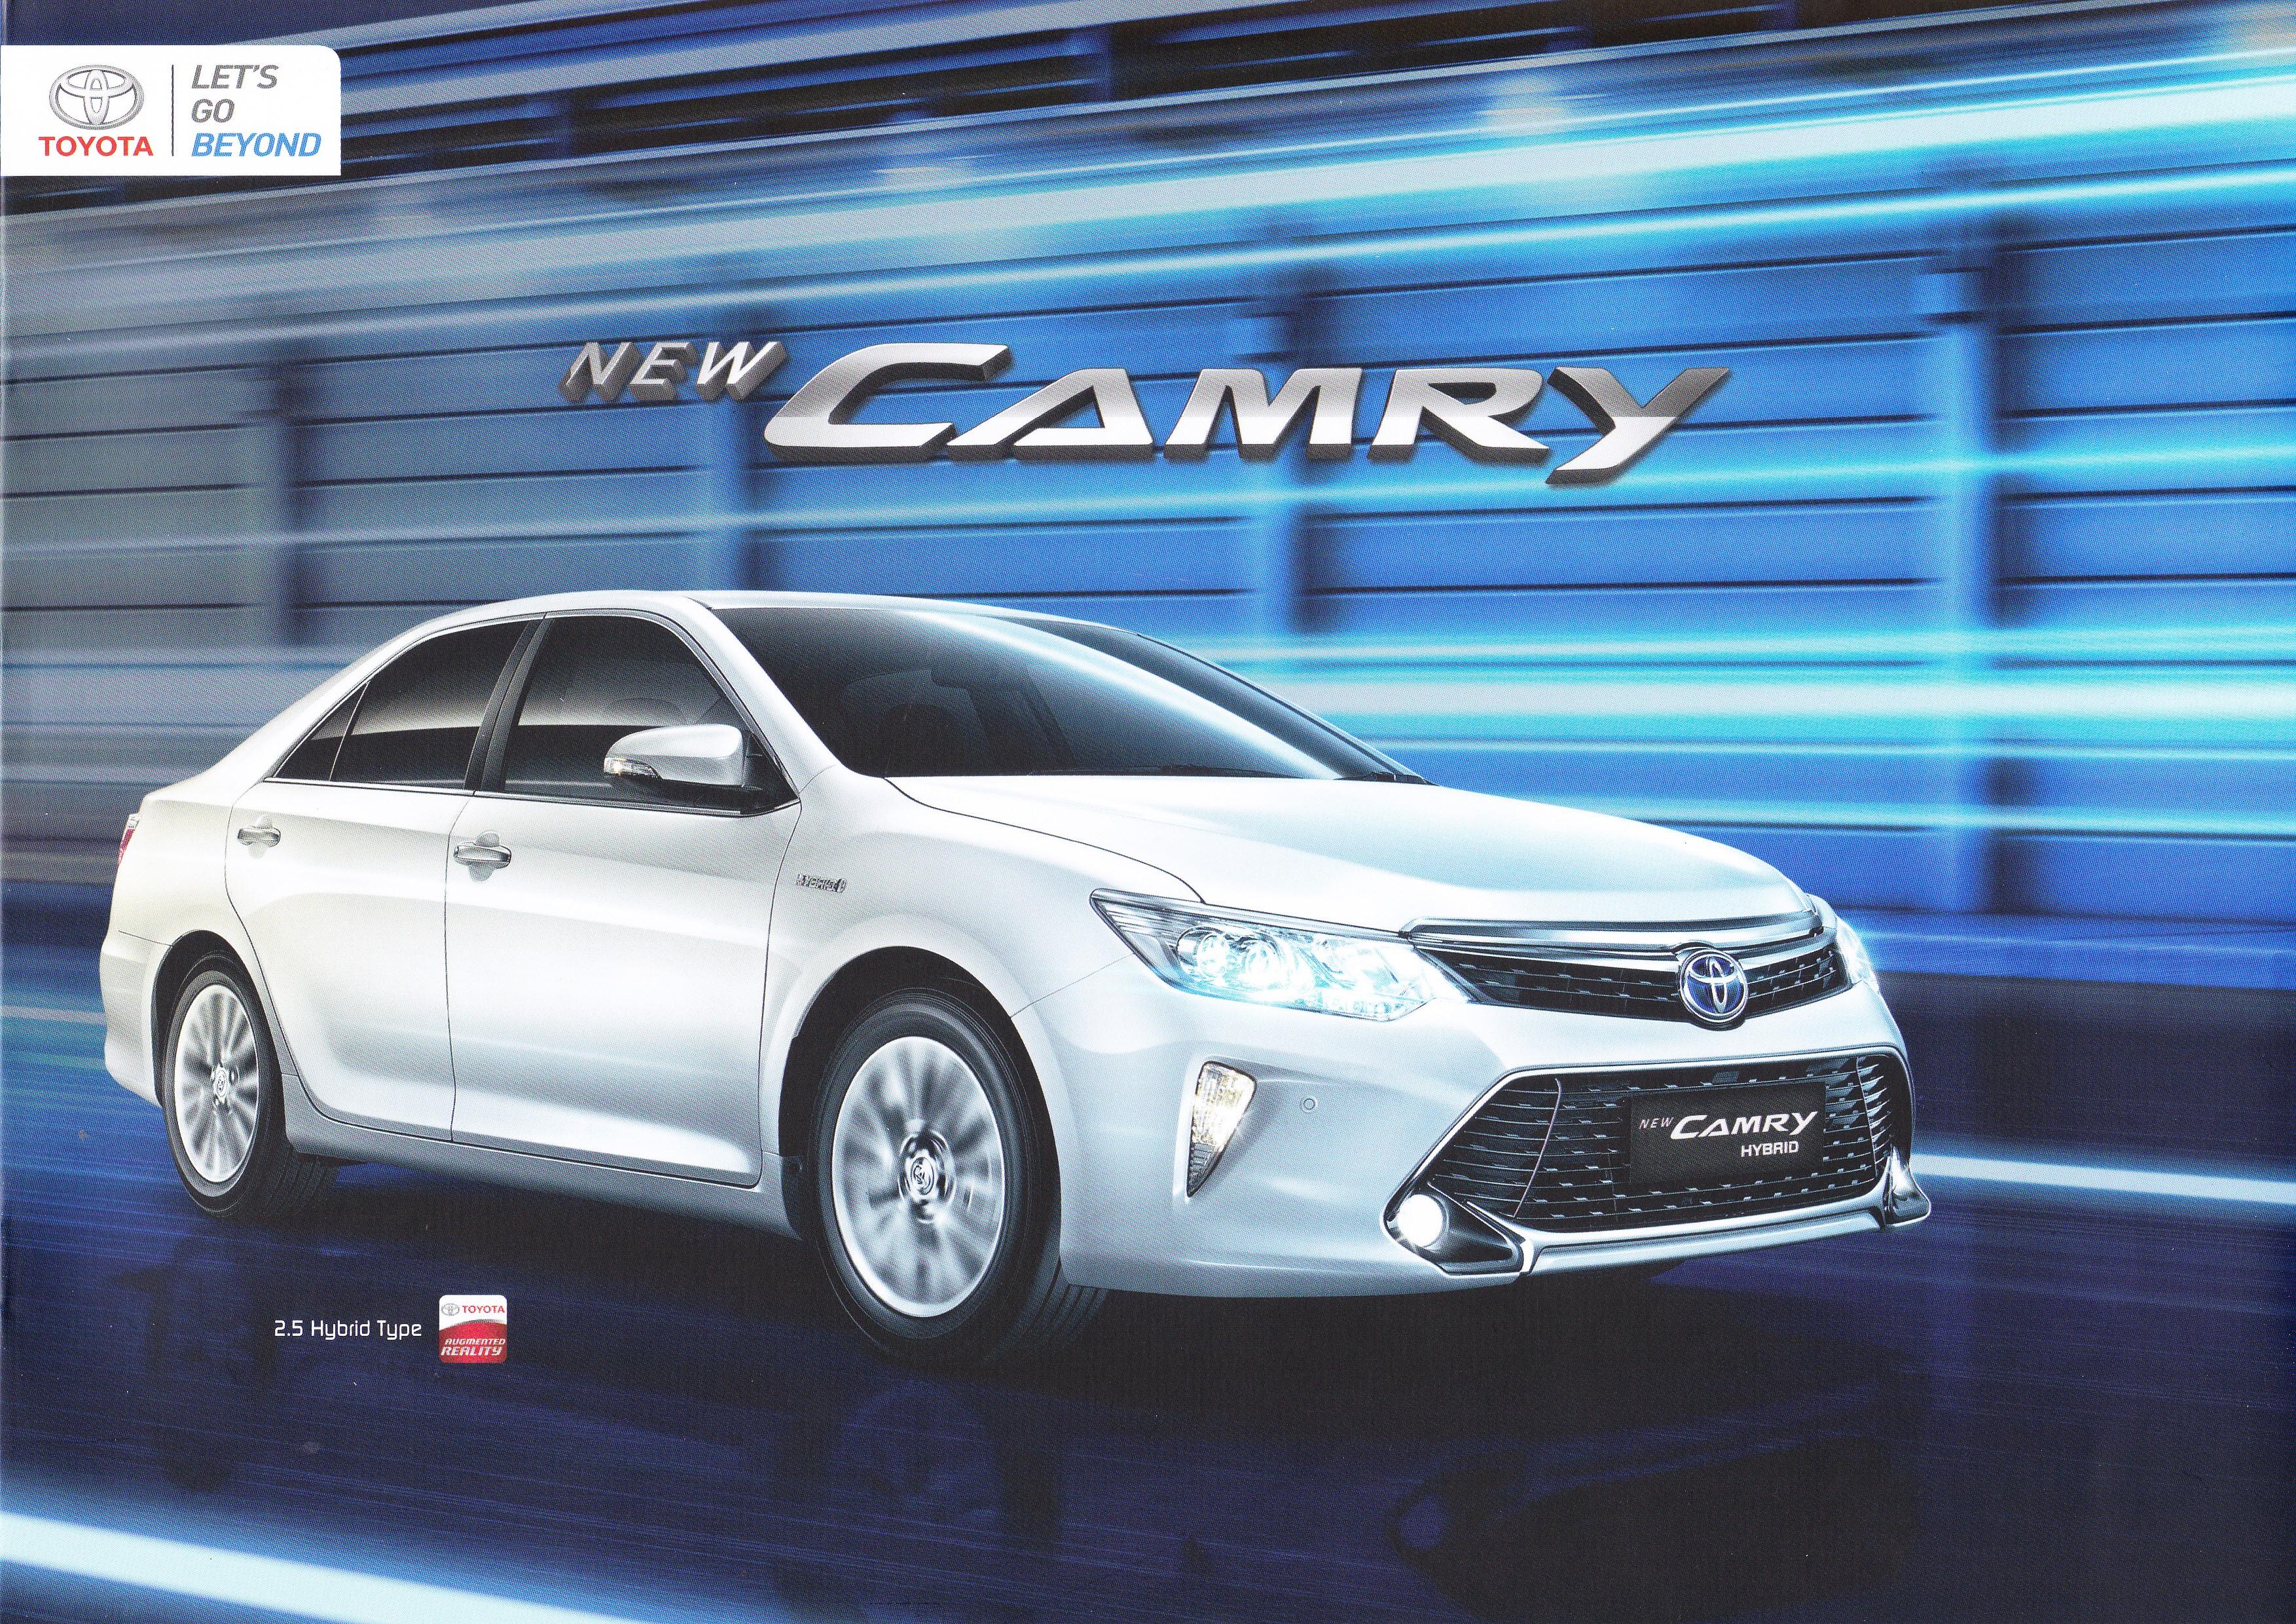 Brosur Mobil Toyota New Camry Jakarta